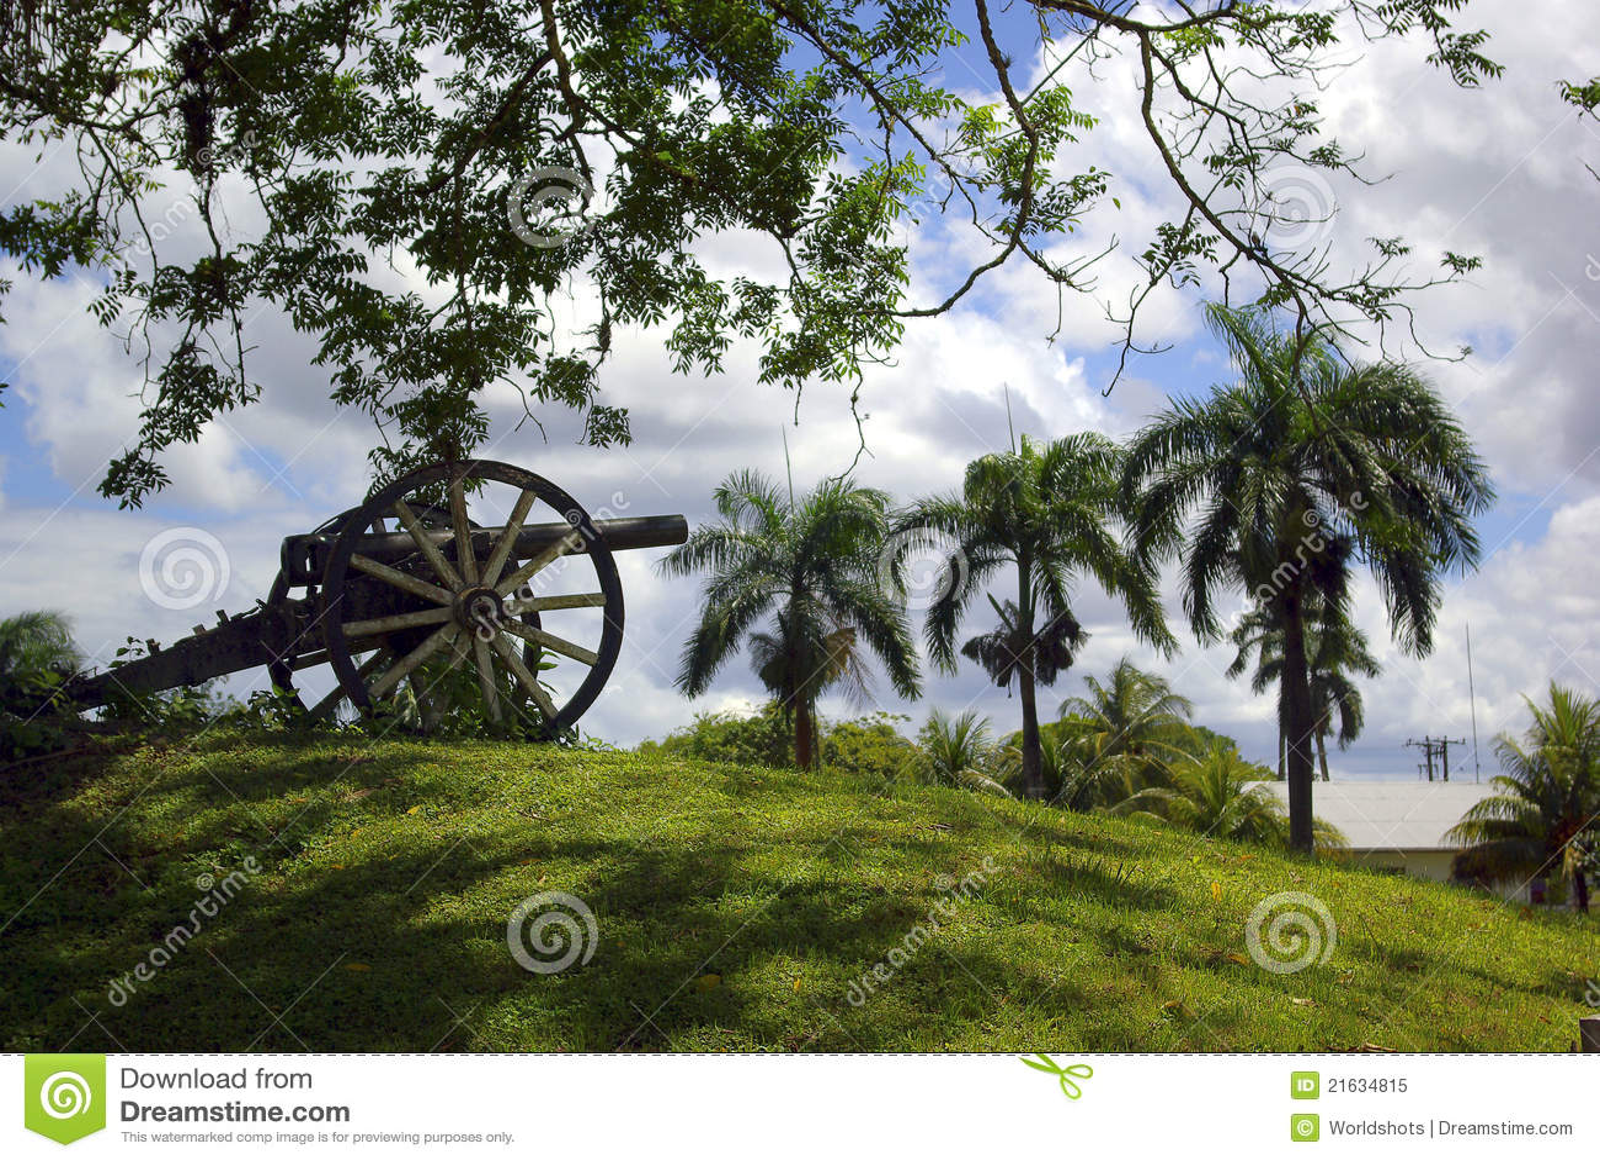 Colonial canon